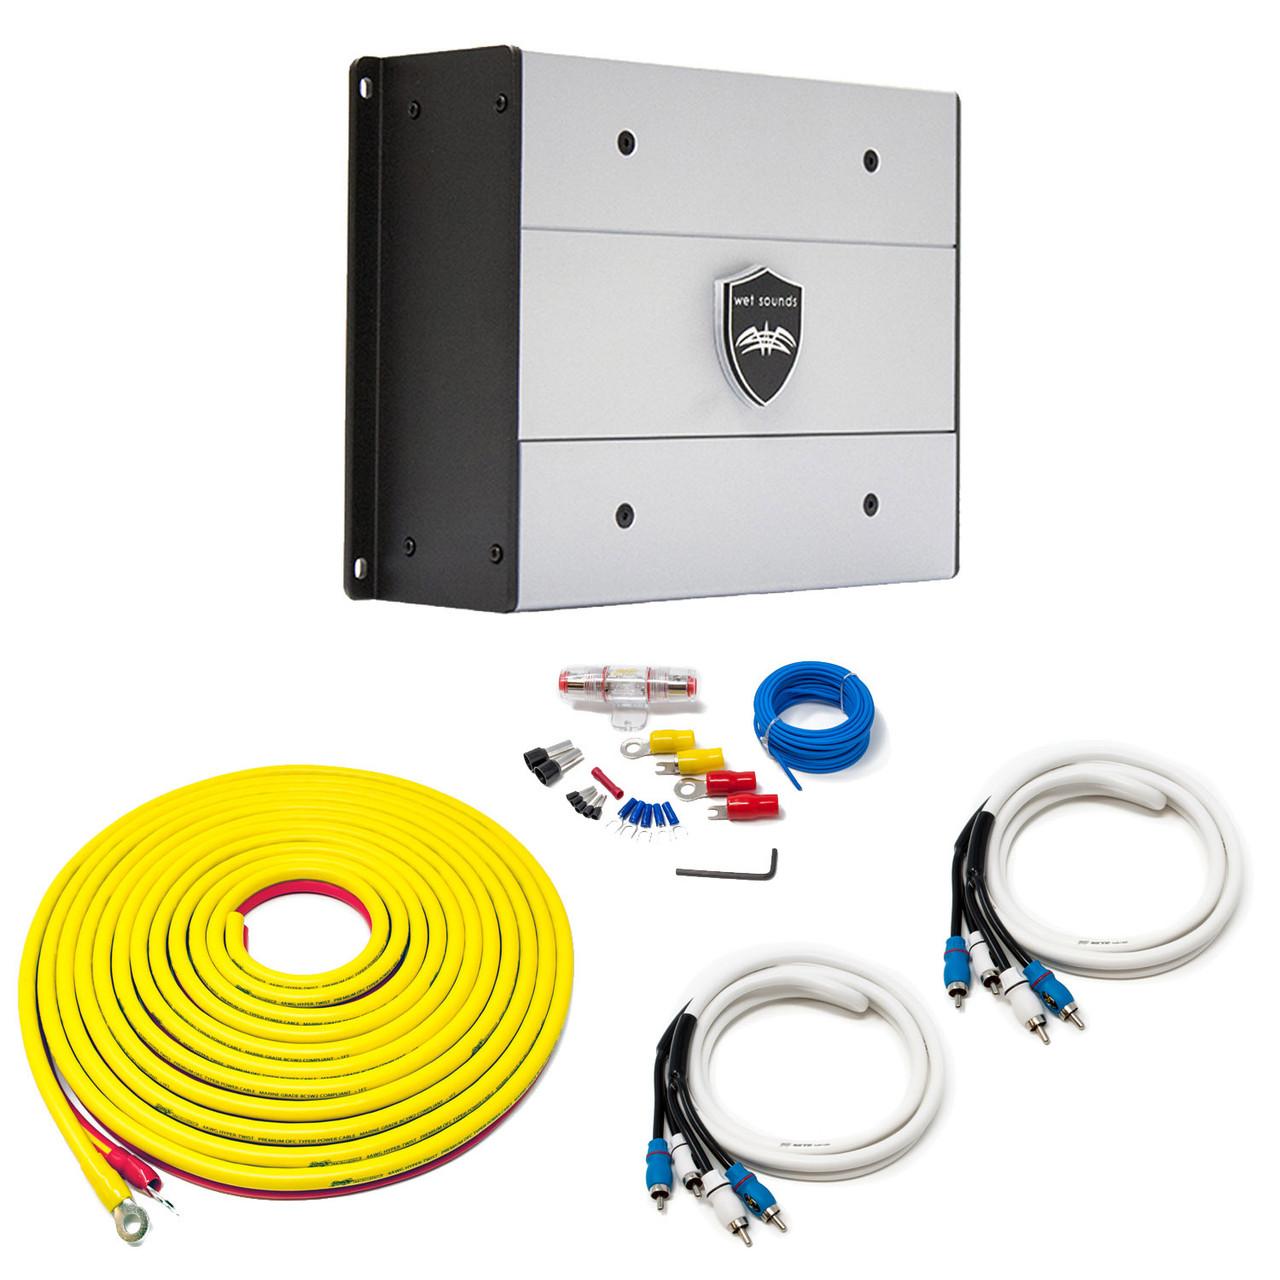 Wet Sounds HTX4 Package: 600 watt 4-channel amplifier & Stinger 7-Meter  4-Gauge Amplifier Wiring Kit w/ RCAs - Creative AudioCreative Audio